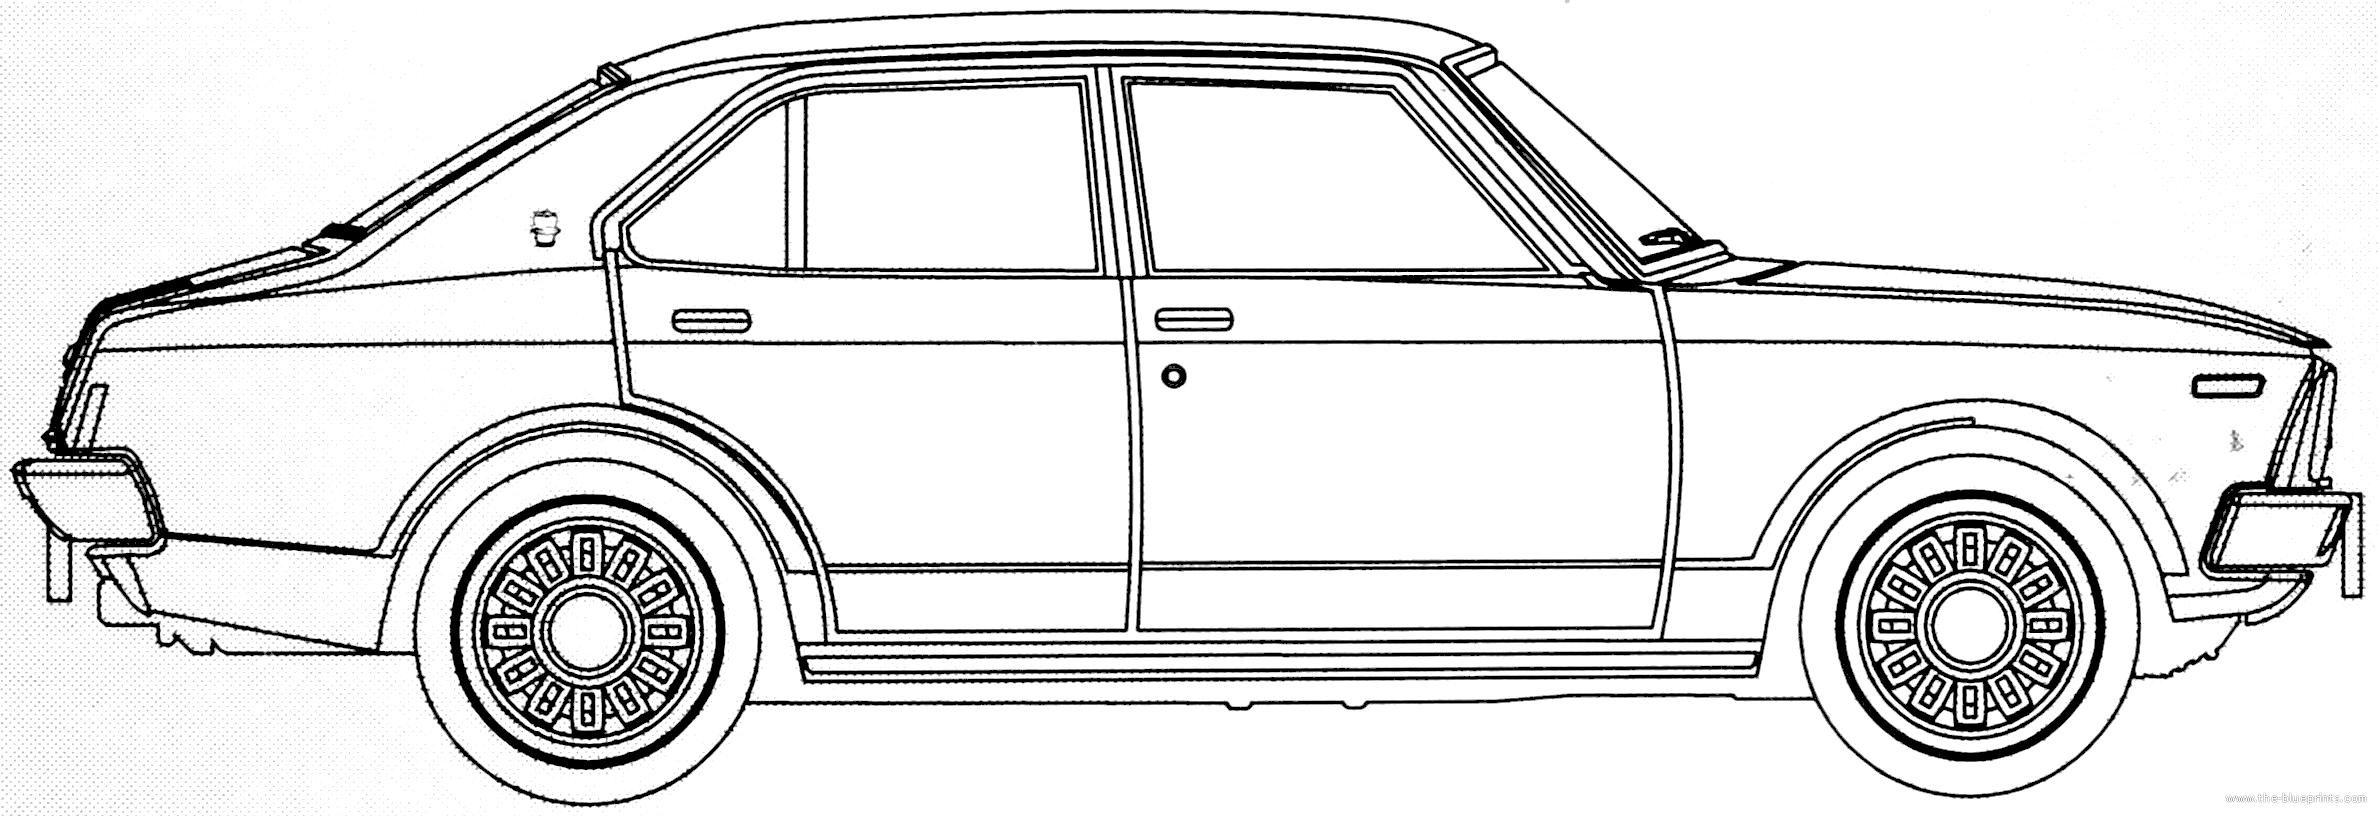 Blueprints Gt Cars Gt Toyota Gt Toyota Carina 1400 Dx 1973